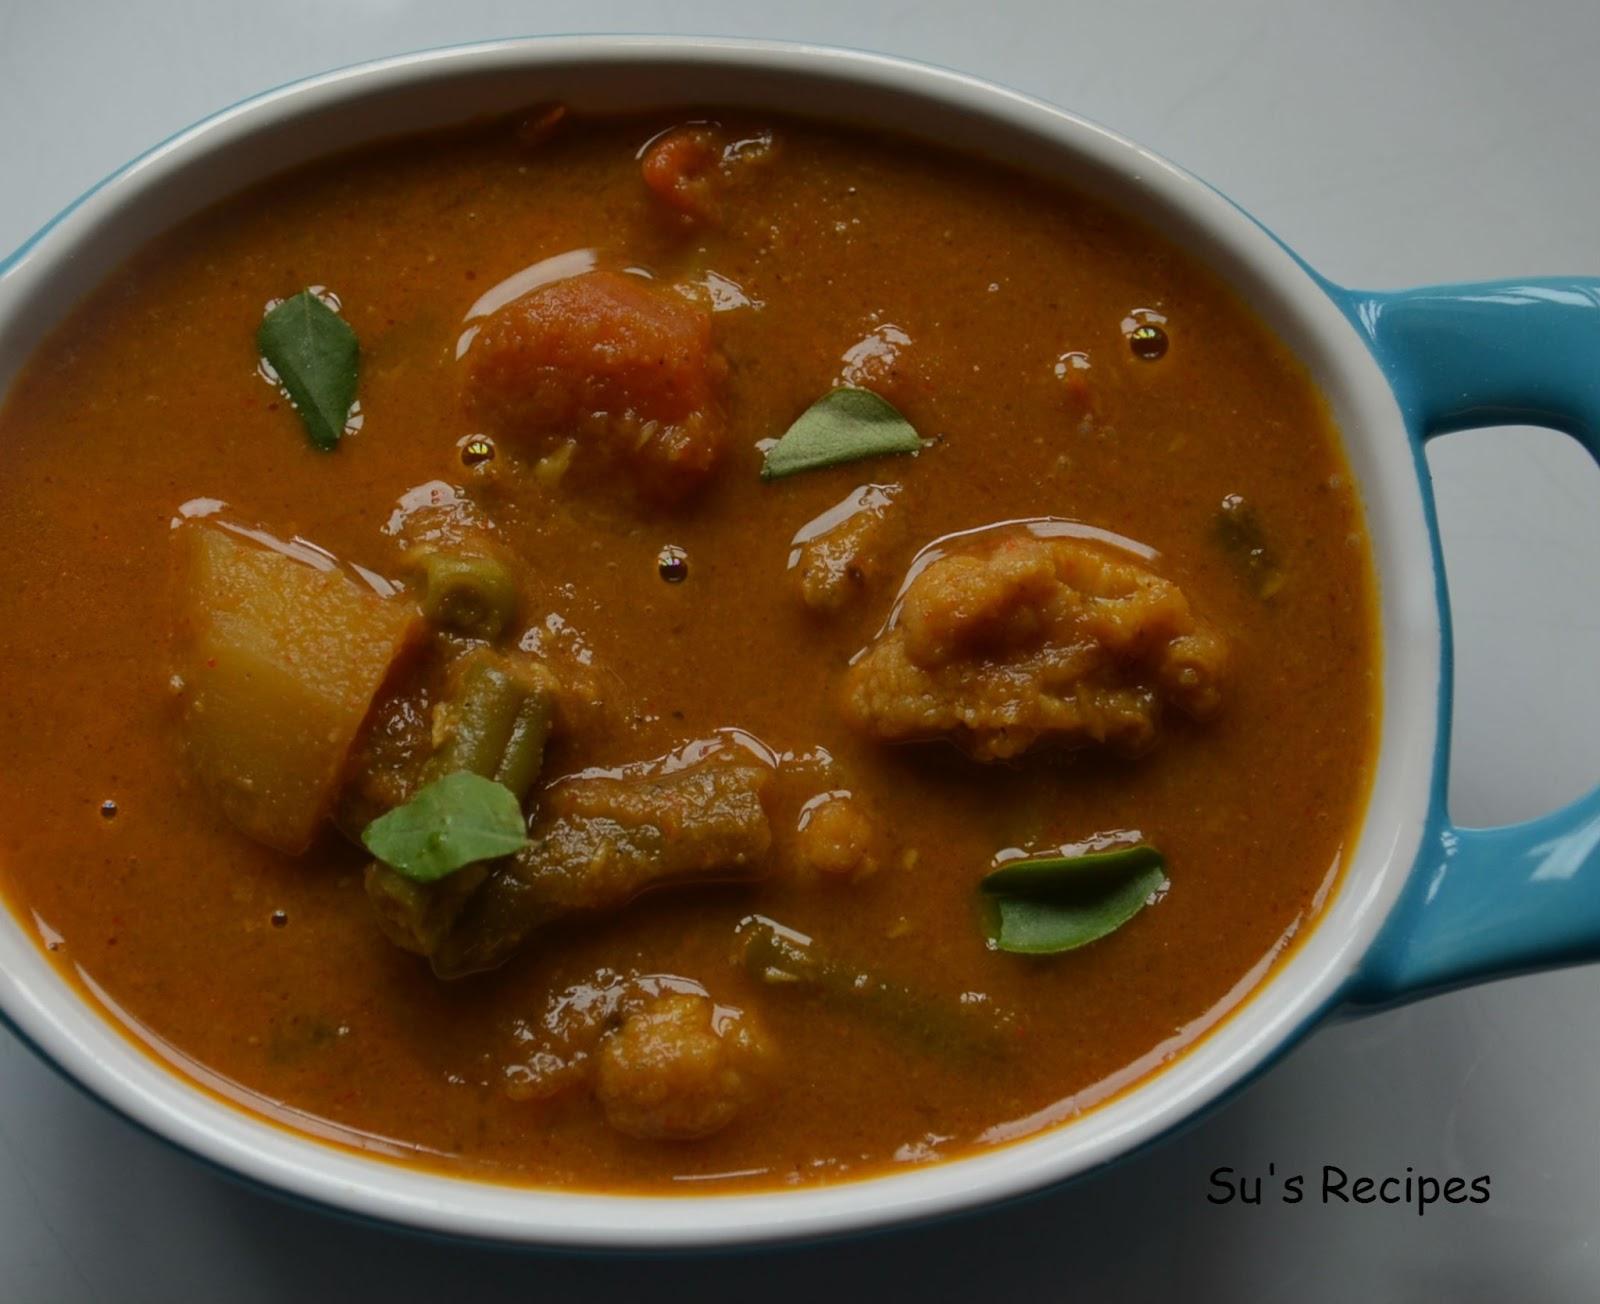 vegetable kurma, vegetable korma, veg curry, mixed vegetable curry, vegetable gravy, spicy curry, thai curry, veg coconut curry, madras curry, andhra curry, karnataka curry